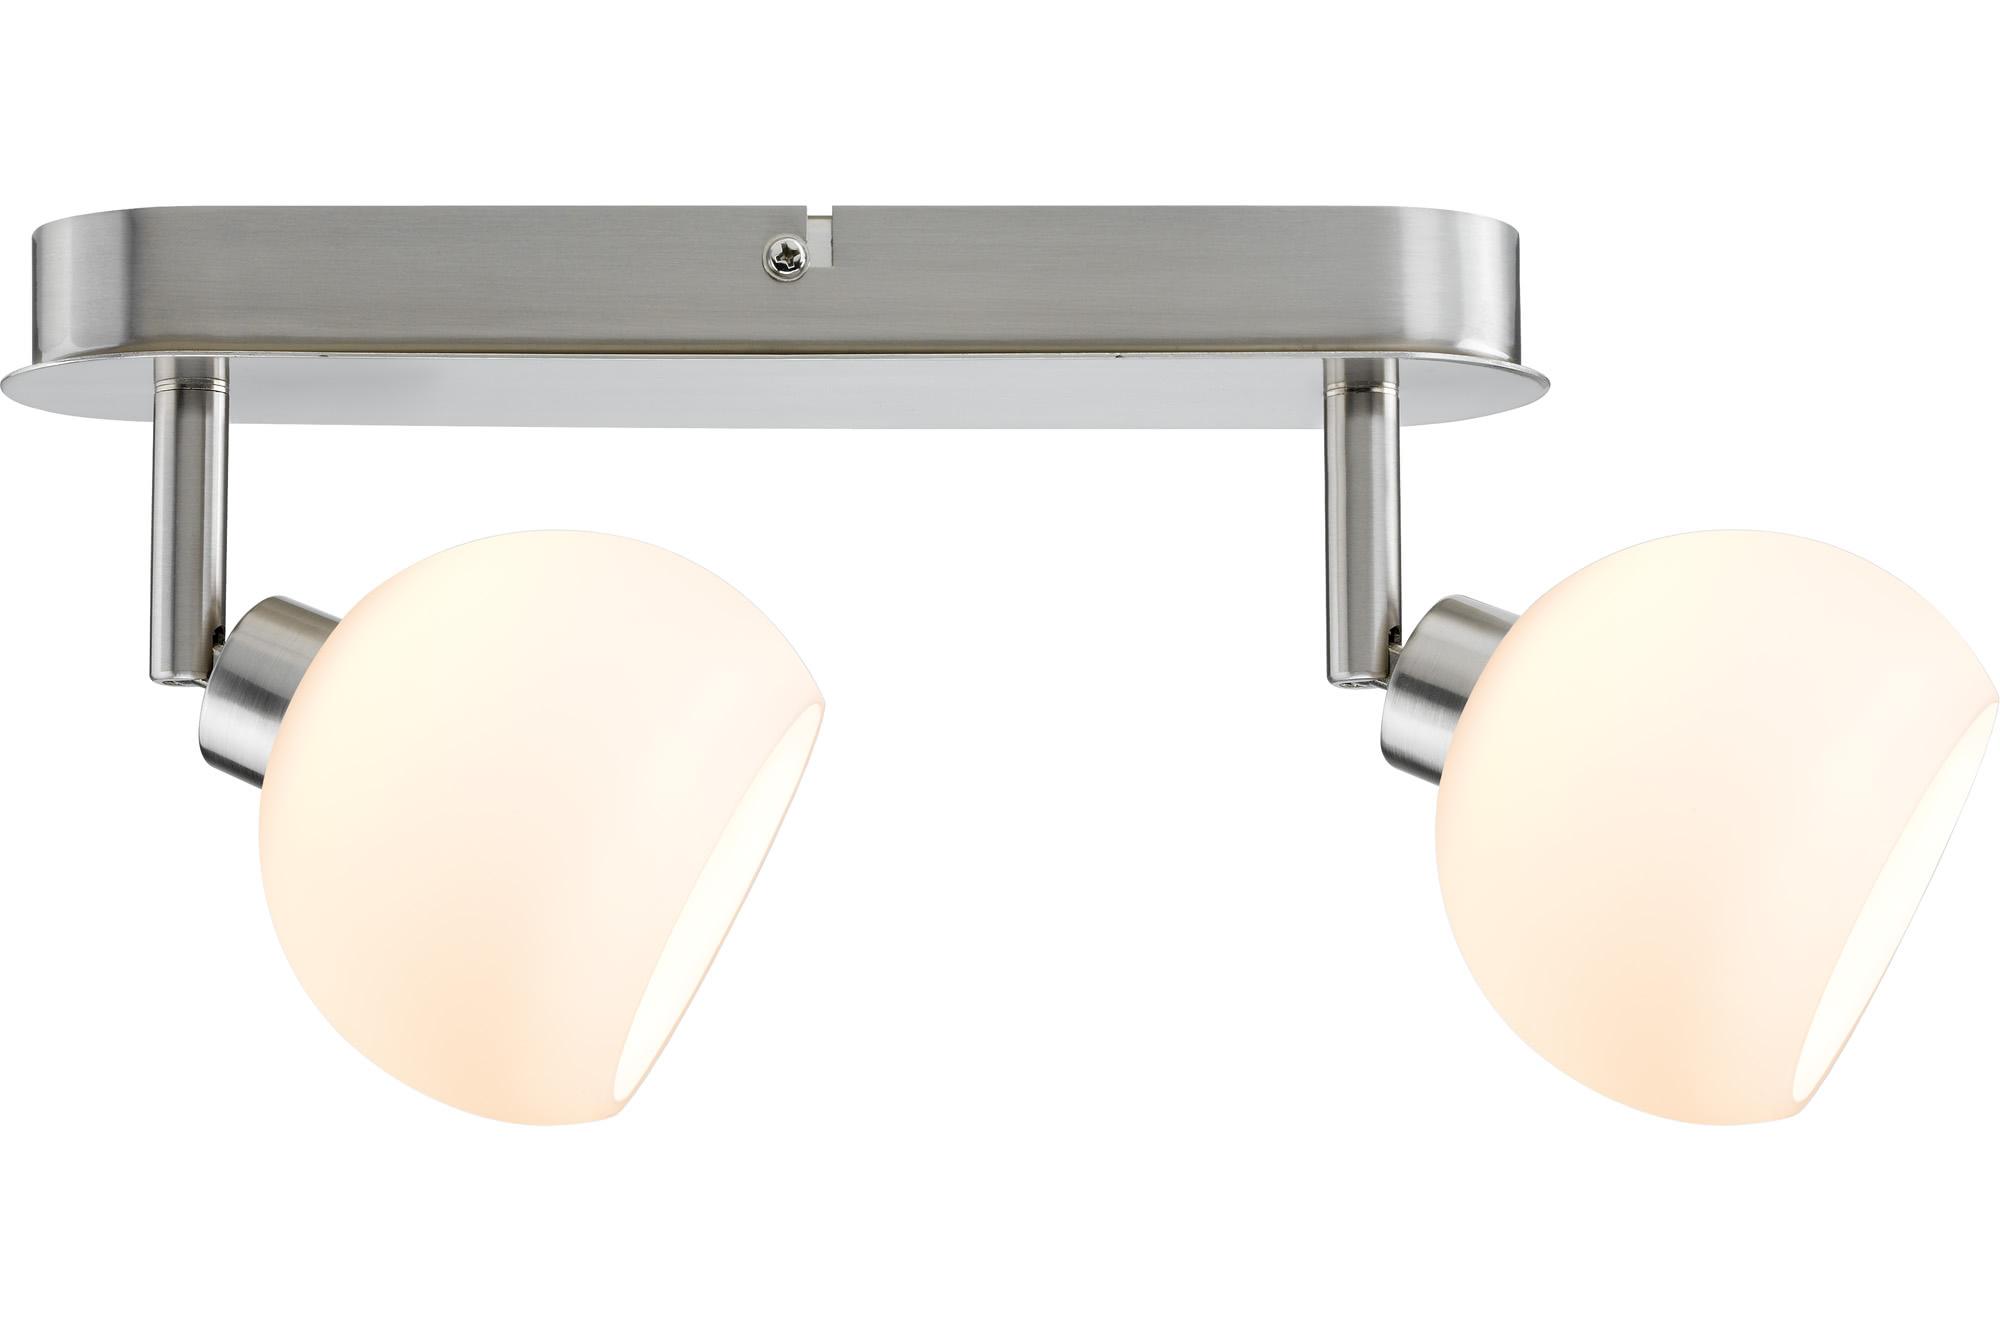 Paulmann. 60295 Светильник Wolbi LED Balken 2x3W GZ10 Eis-g/Ws